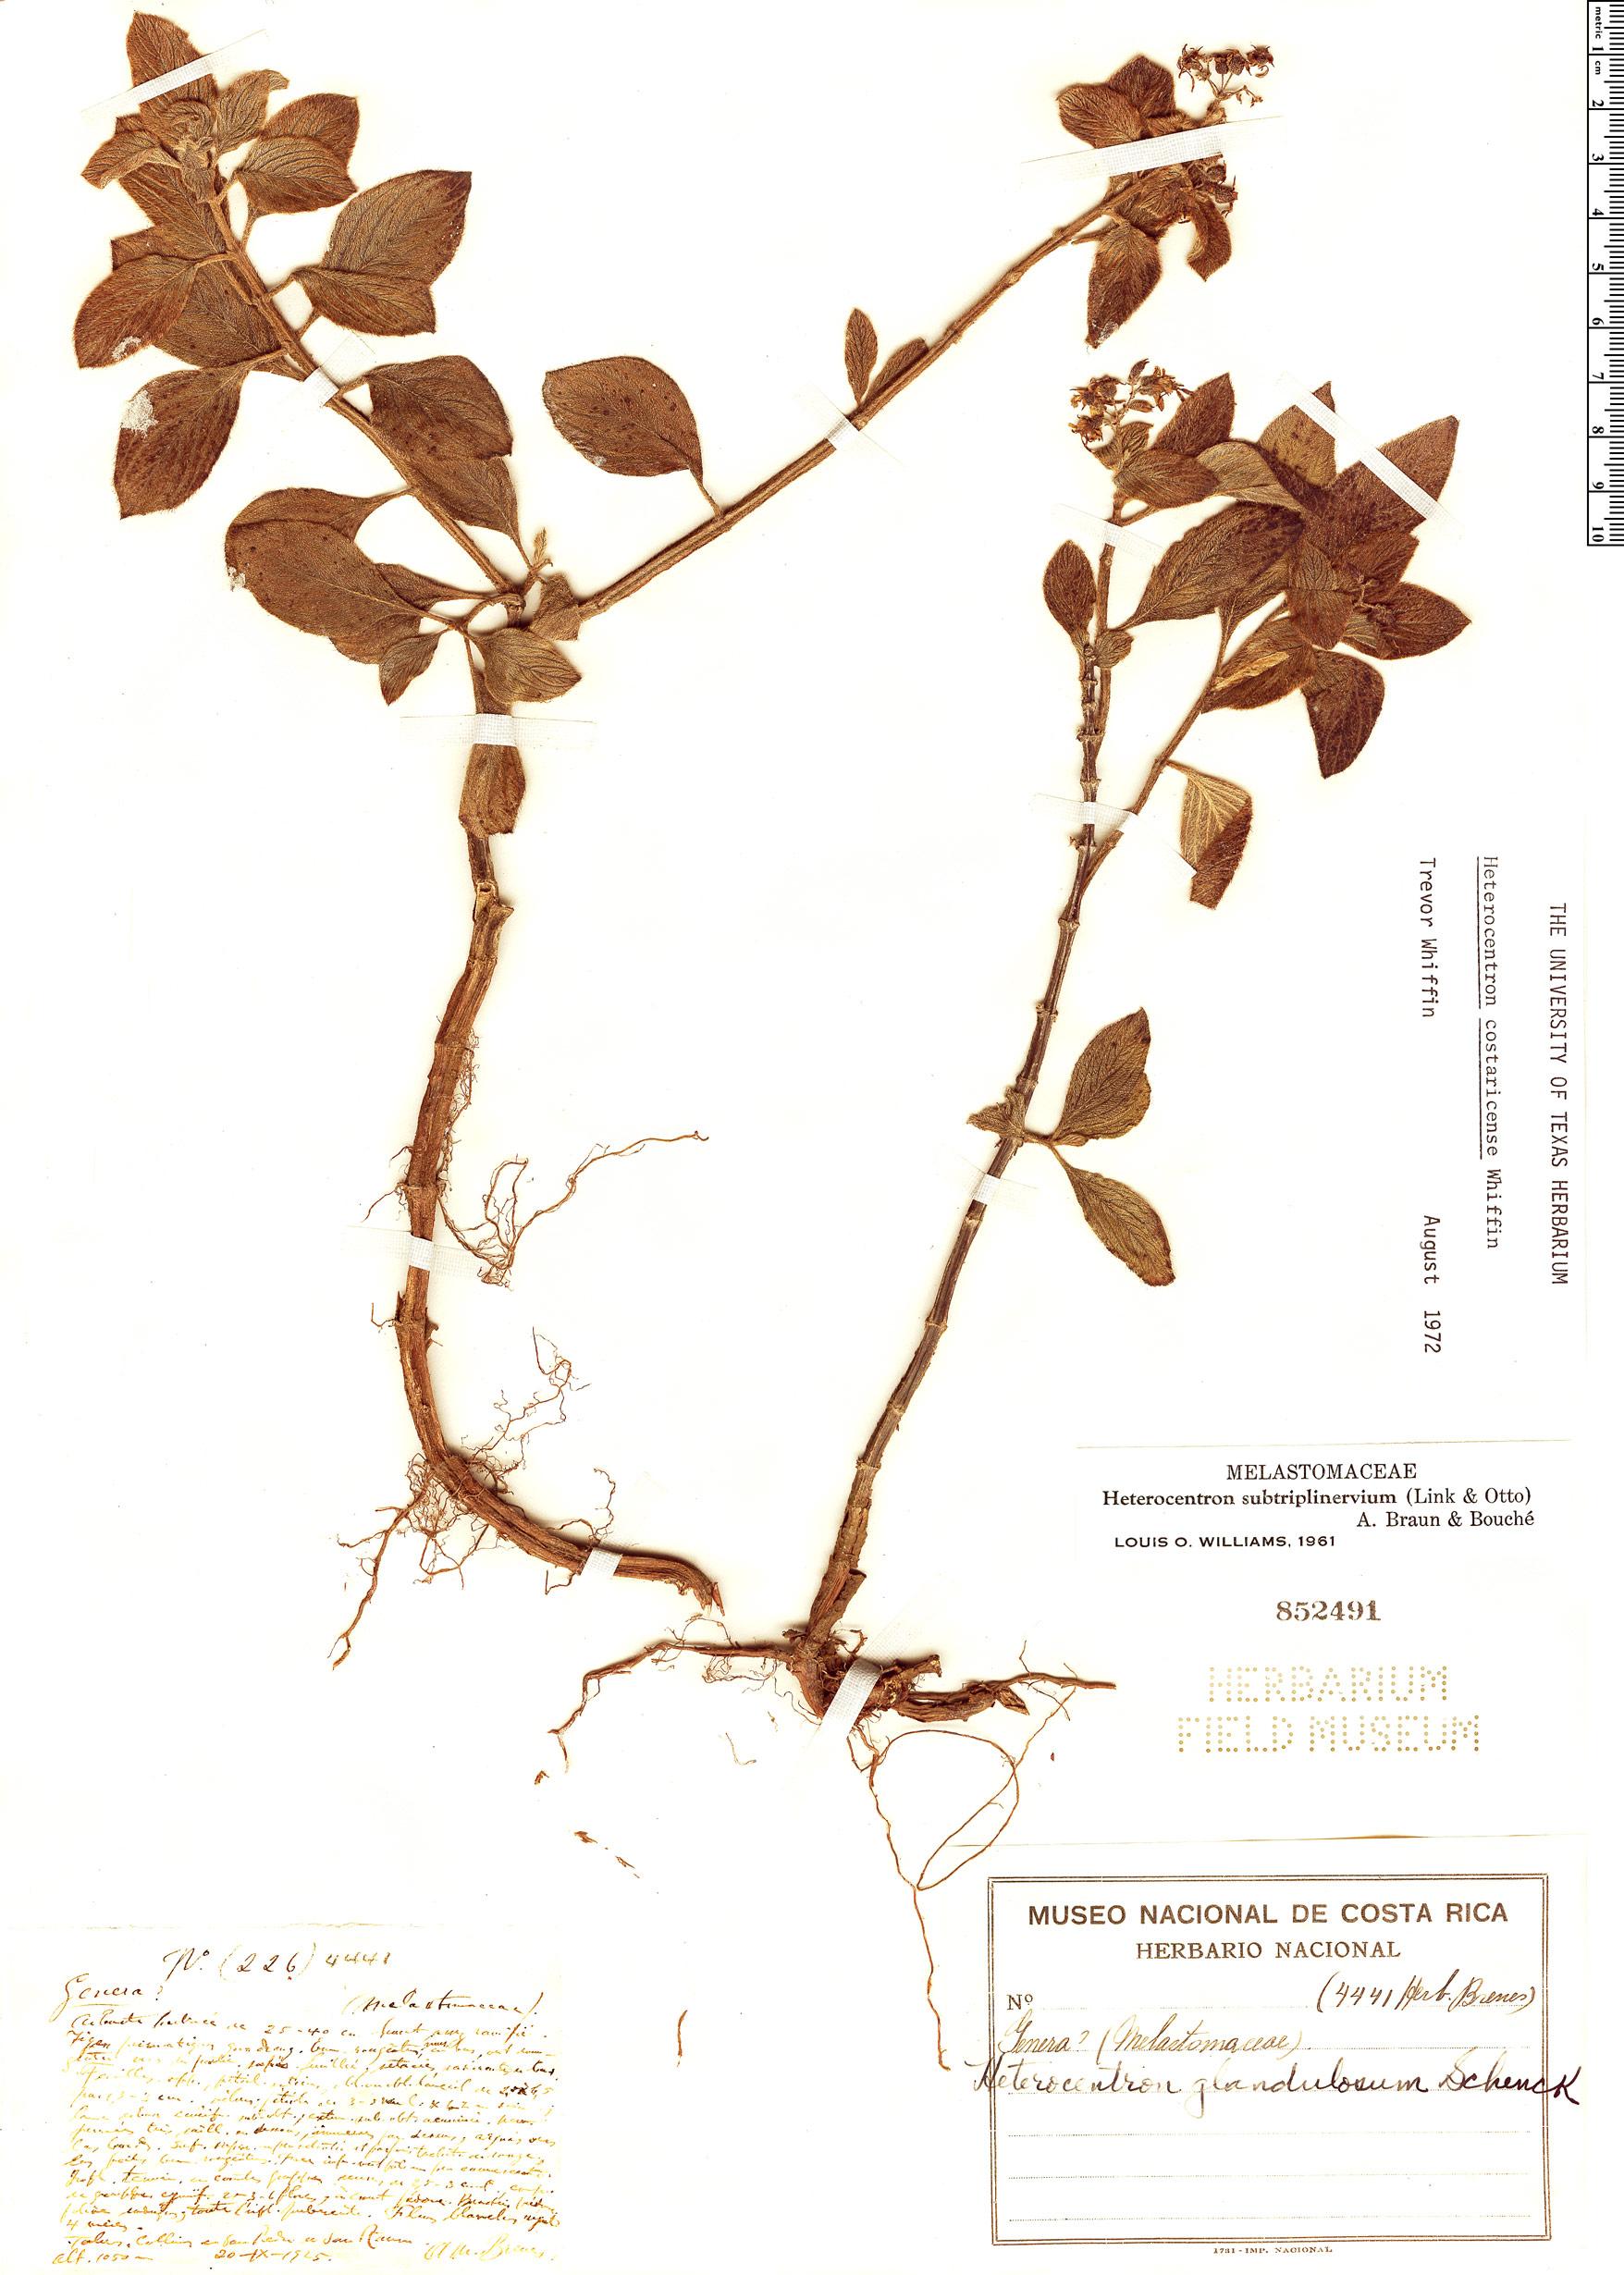 Specimen: Heterocentron costaricense